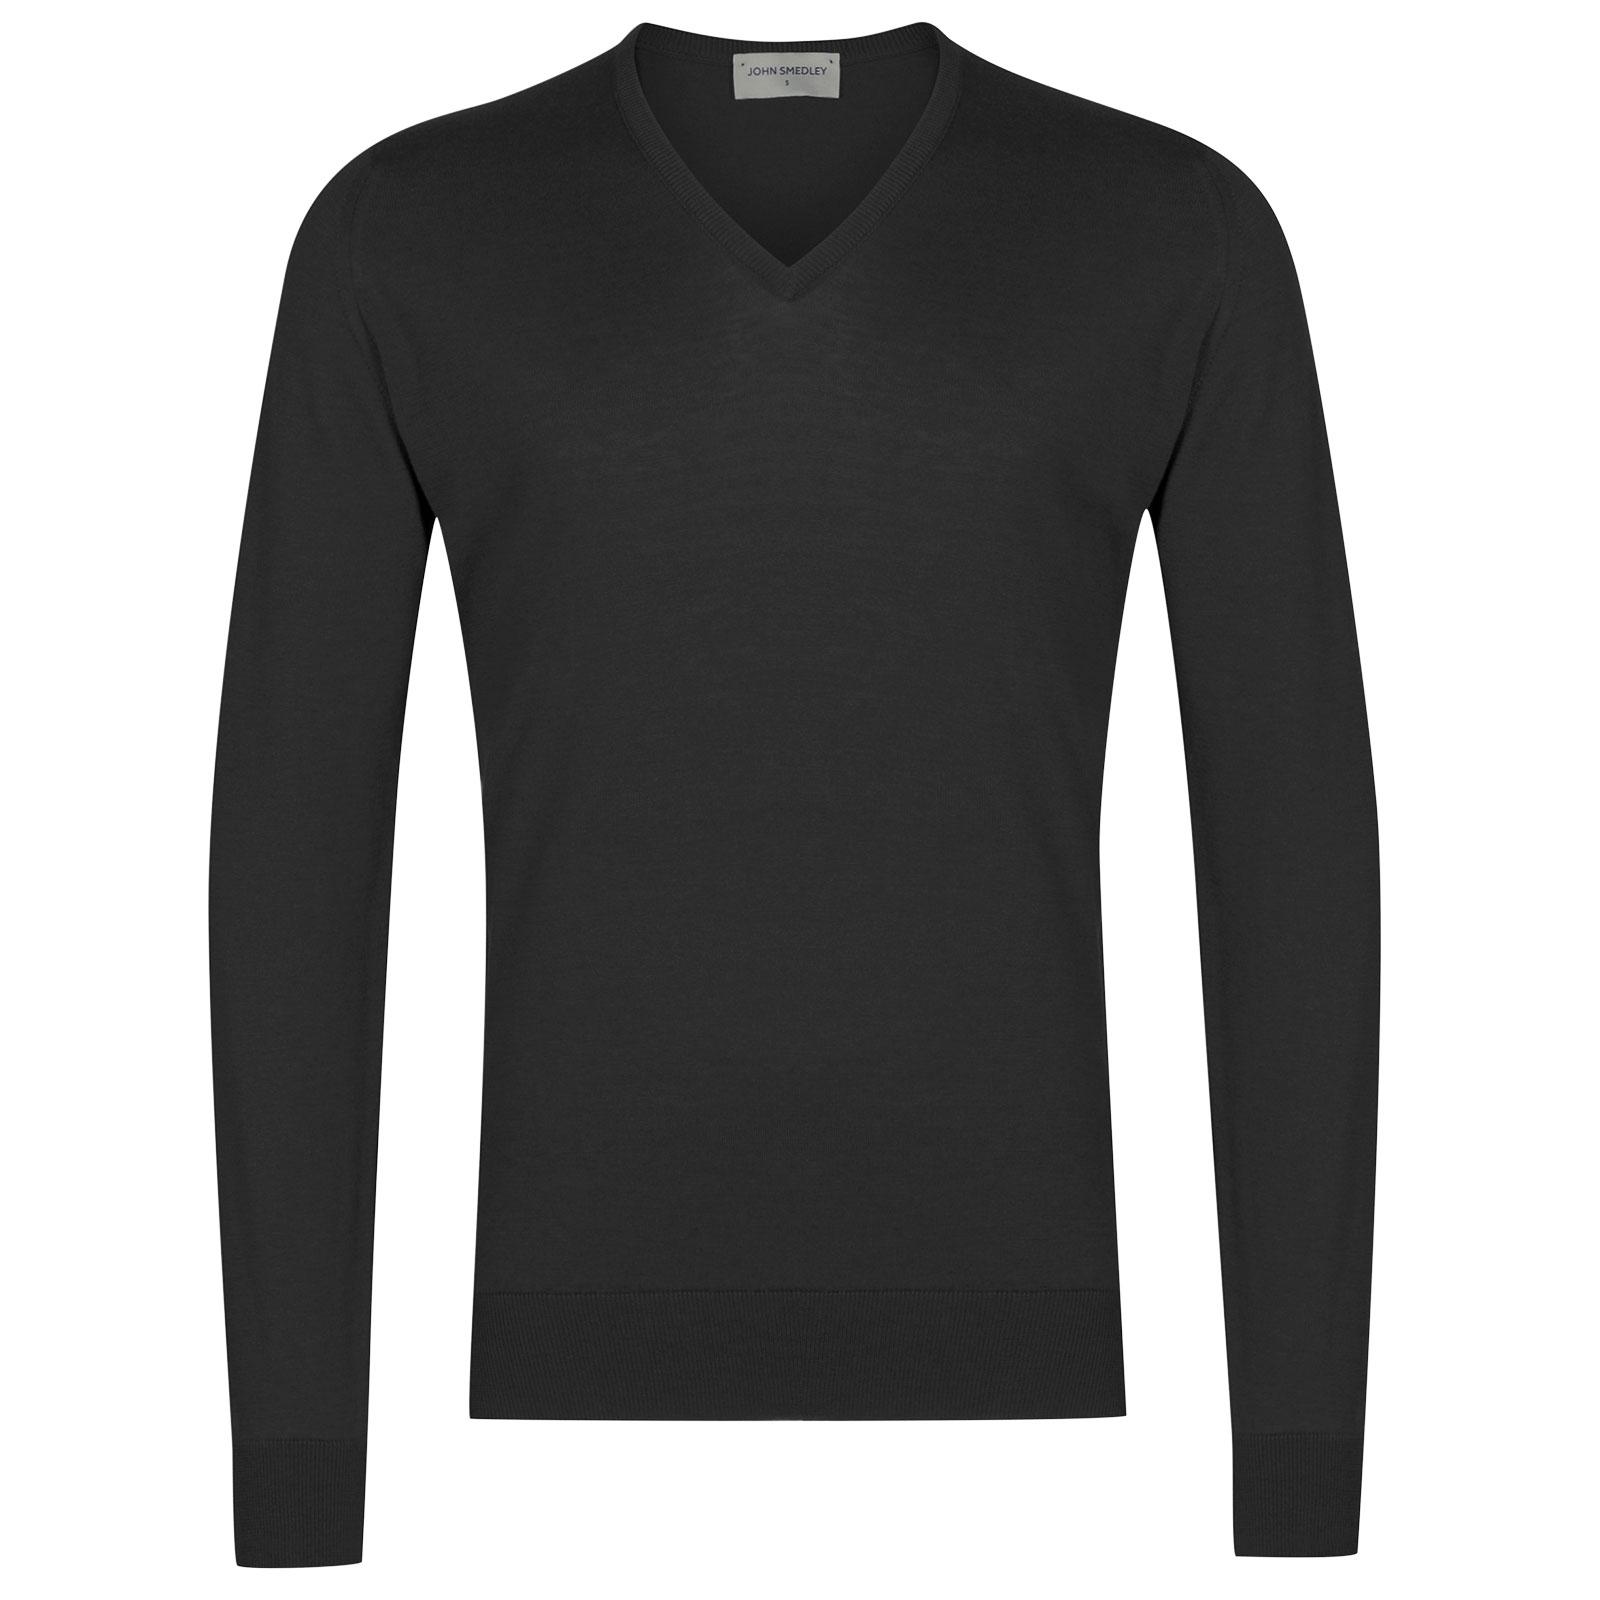 John Smedley Woburn in Flannel Grey Pullover-LGE